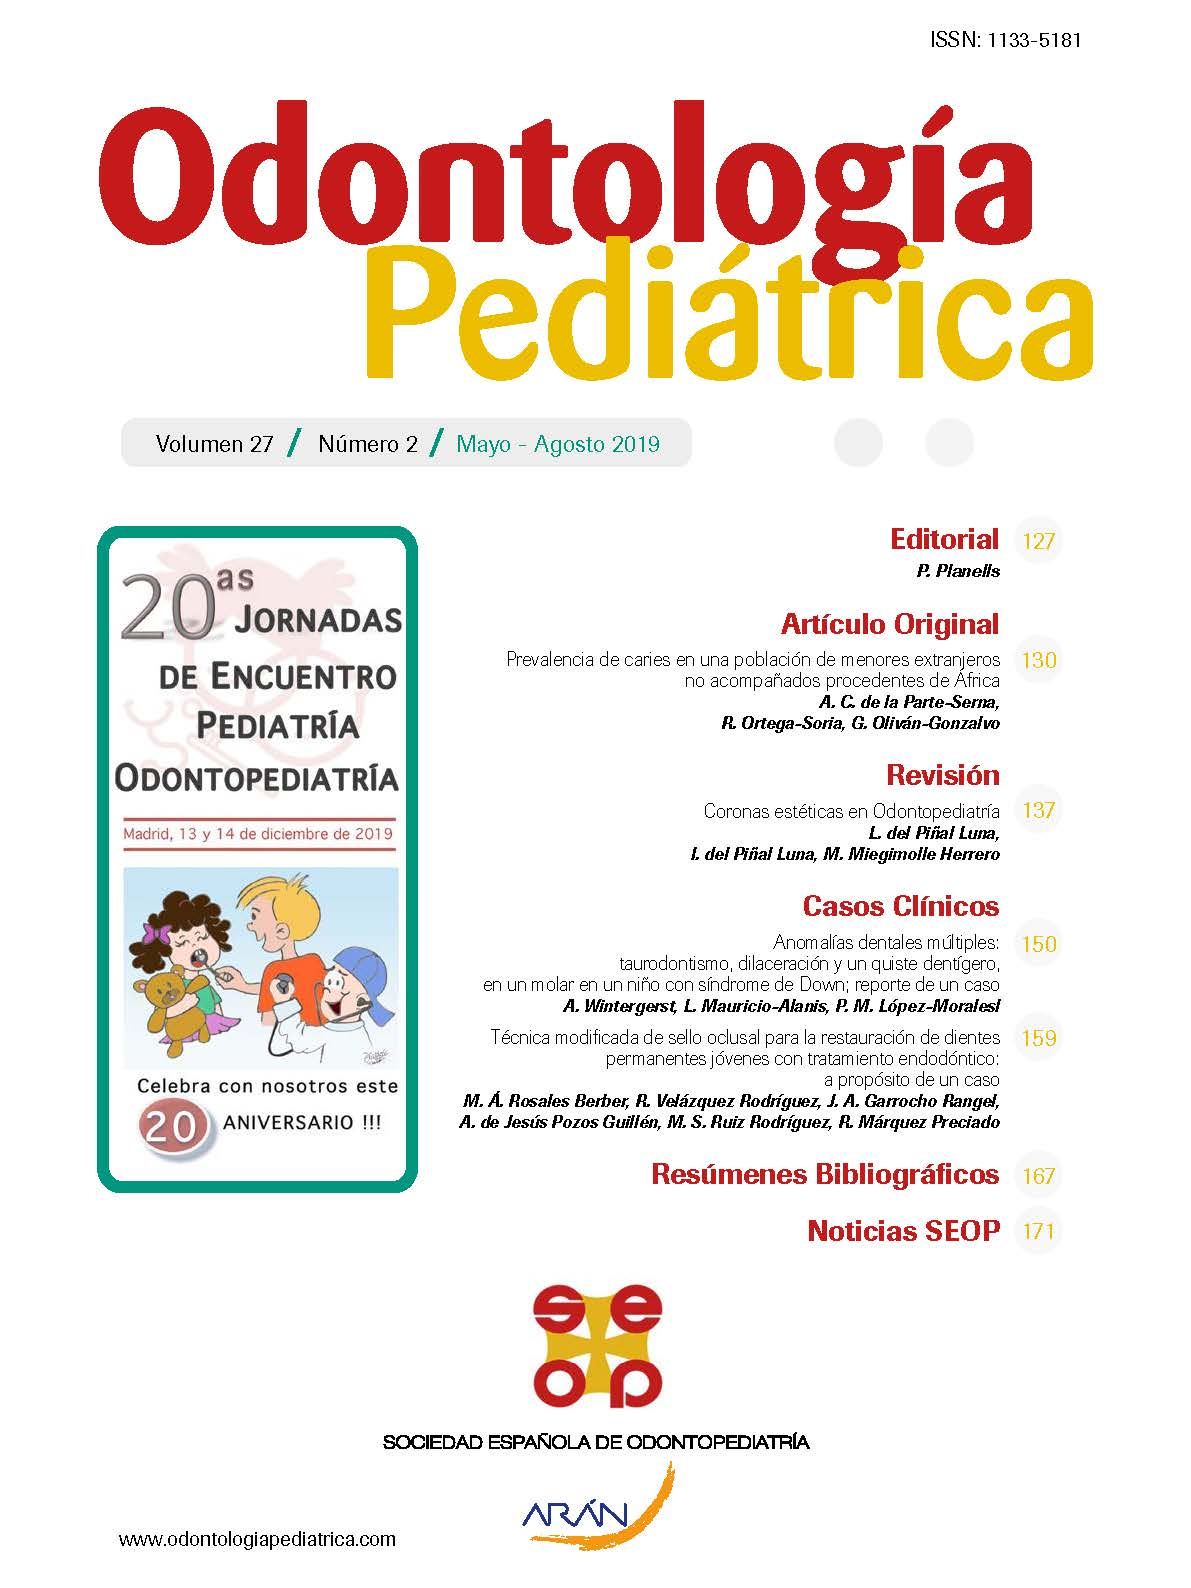 tarifa de mejores prácticas de diabetes pediátrica 2020